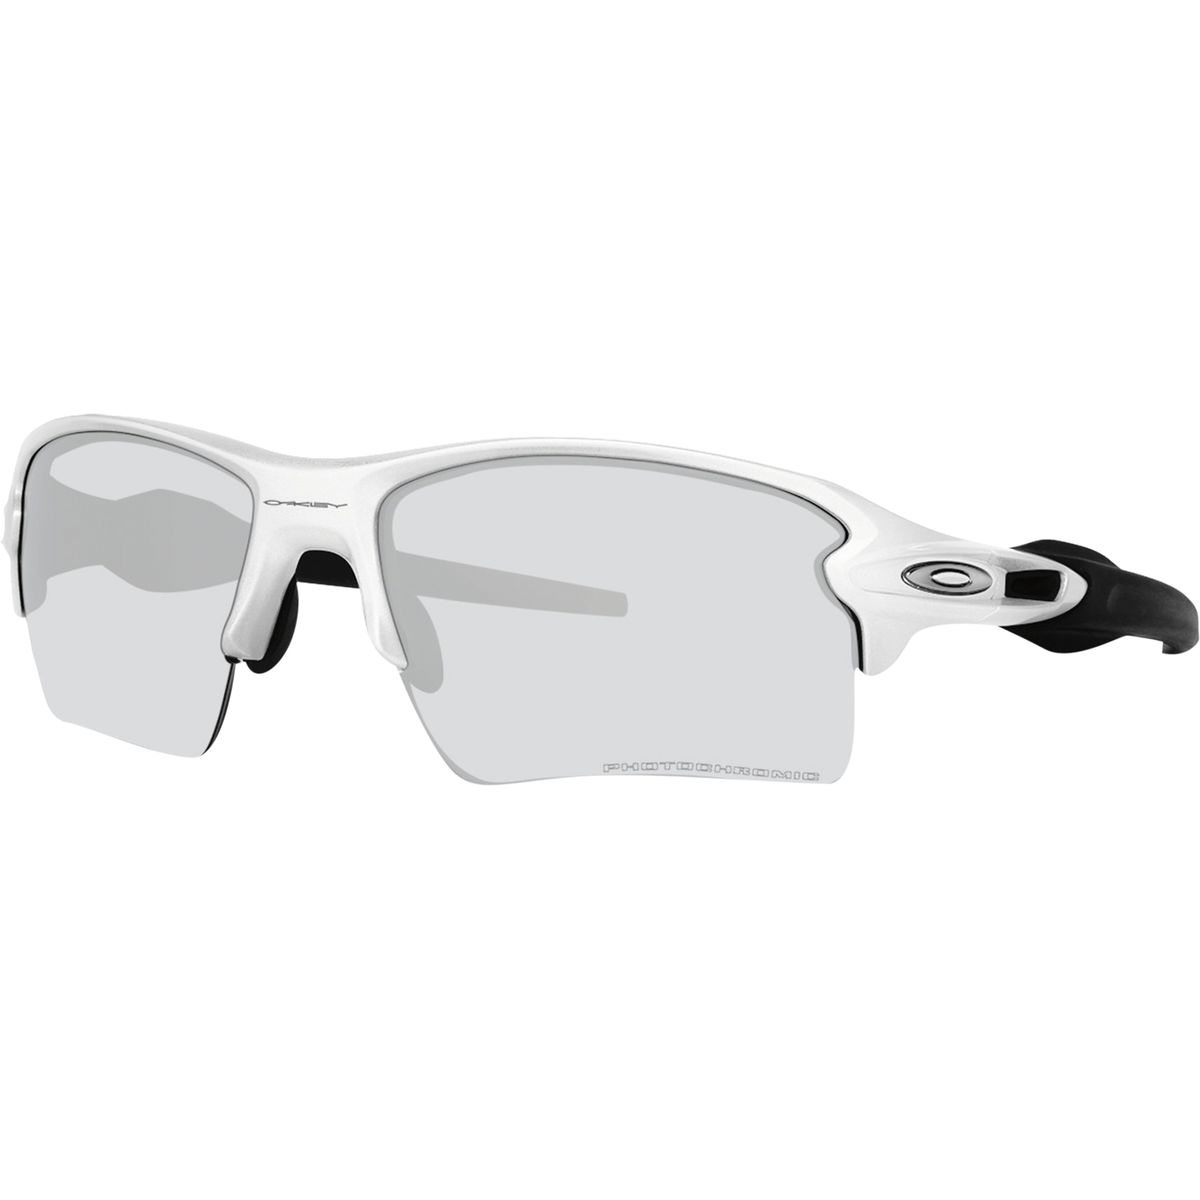 Oakley   Flak 2.0 XL Photochromic Sunglasses - OAK01BD